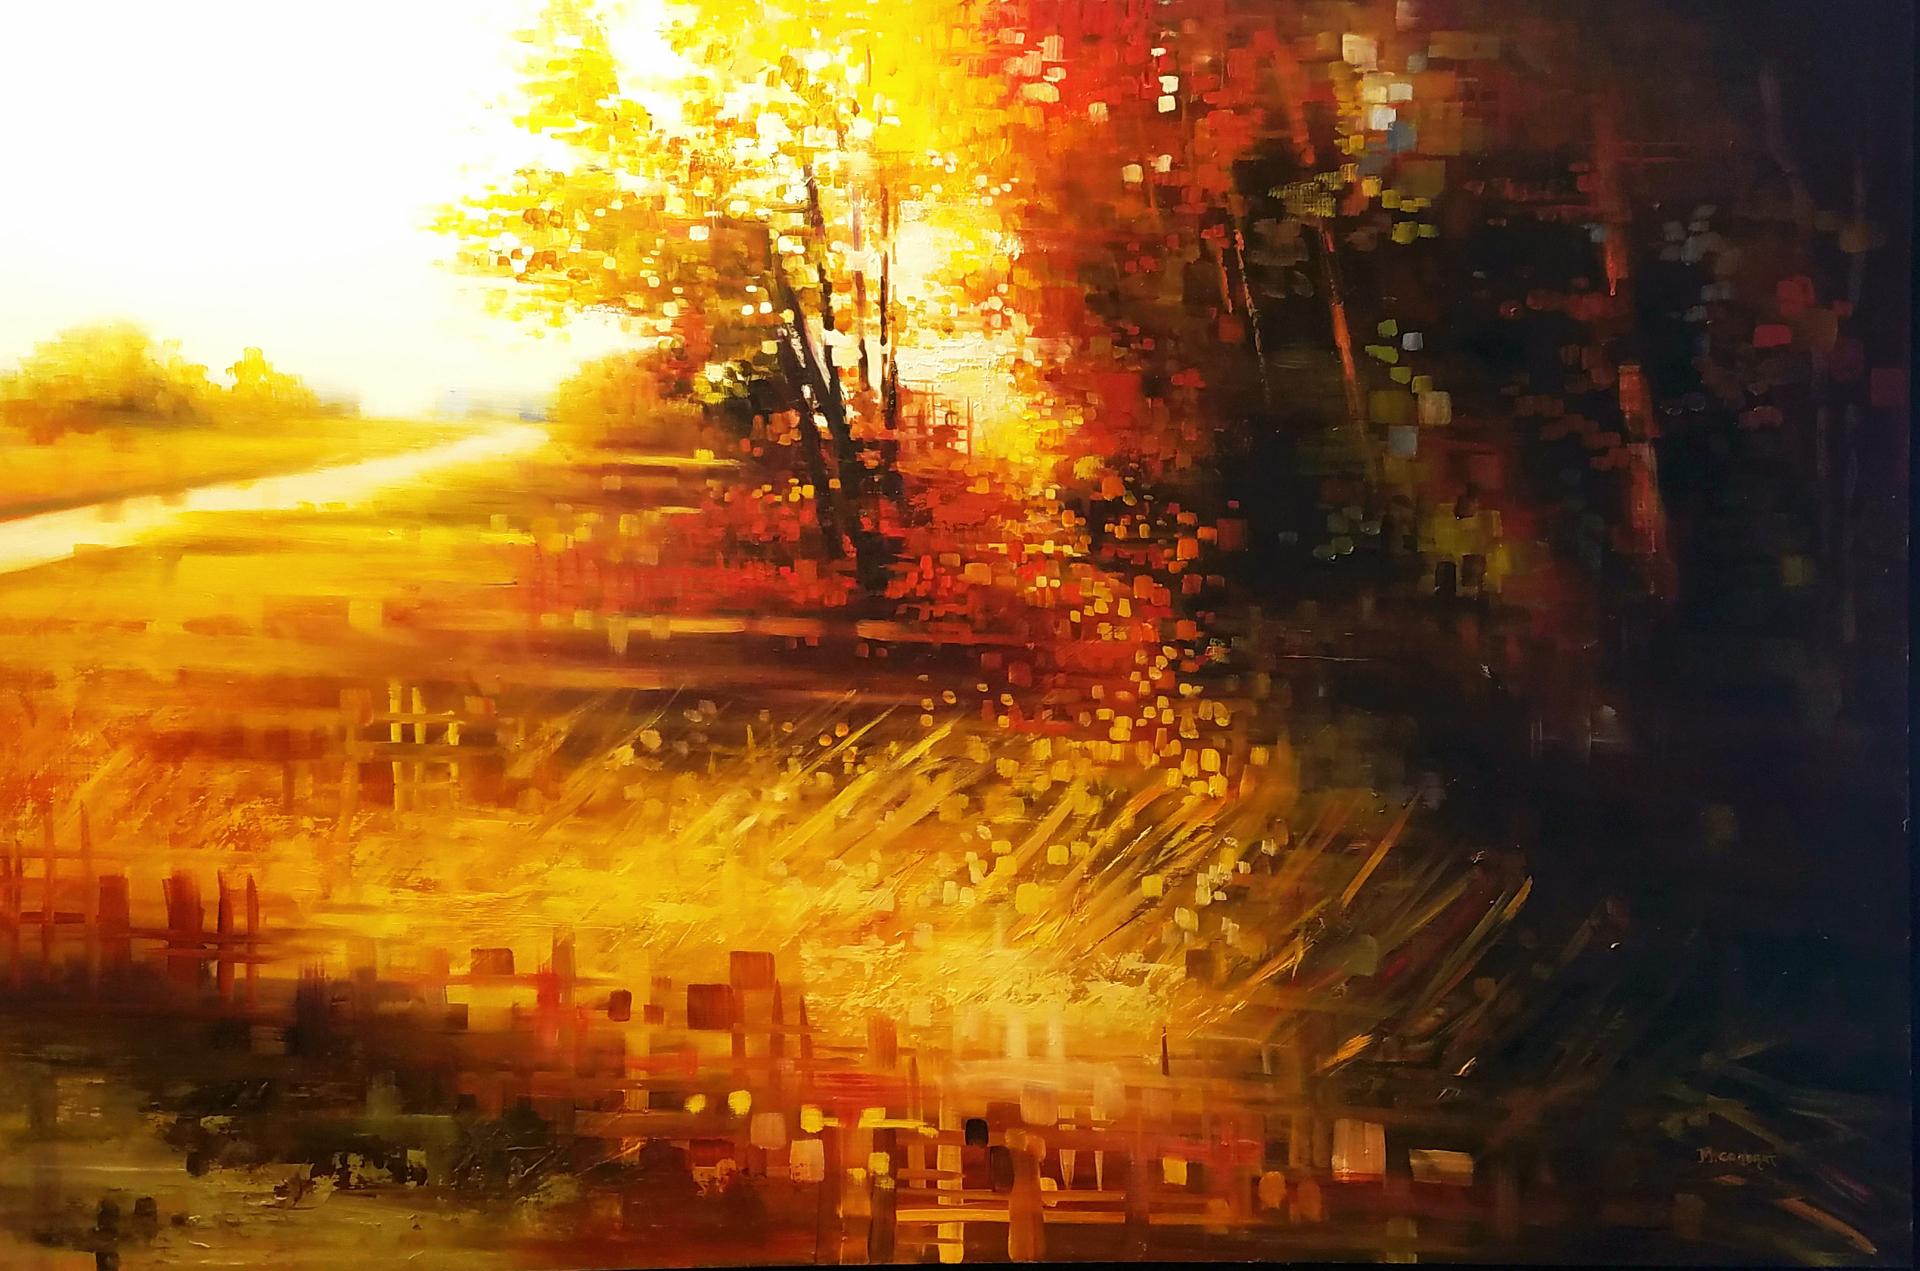 Golden Field by Michelle Condrat